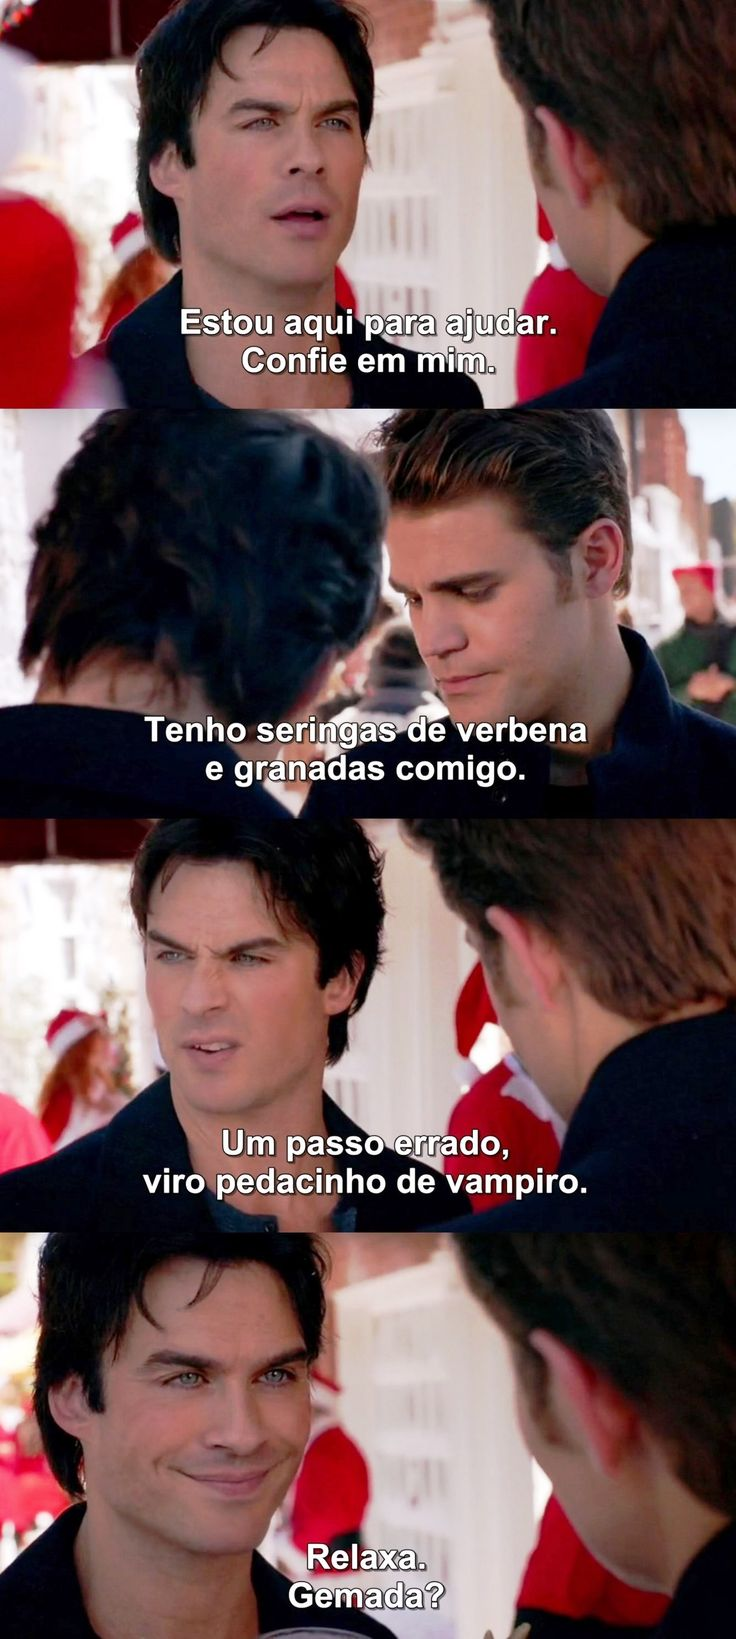 Diários de um vampiro 7x9 - Damon e Stefan